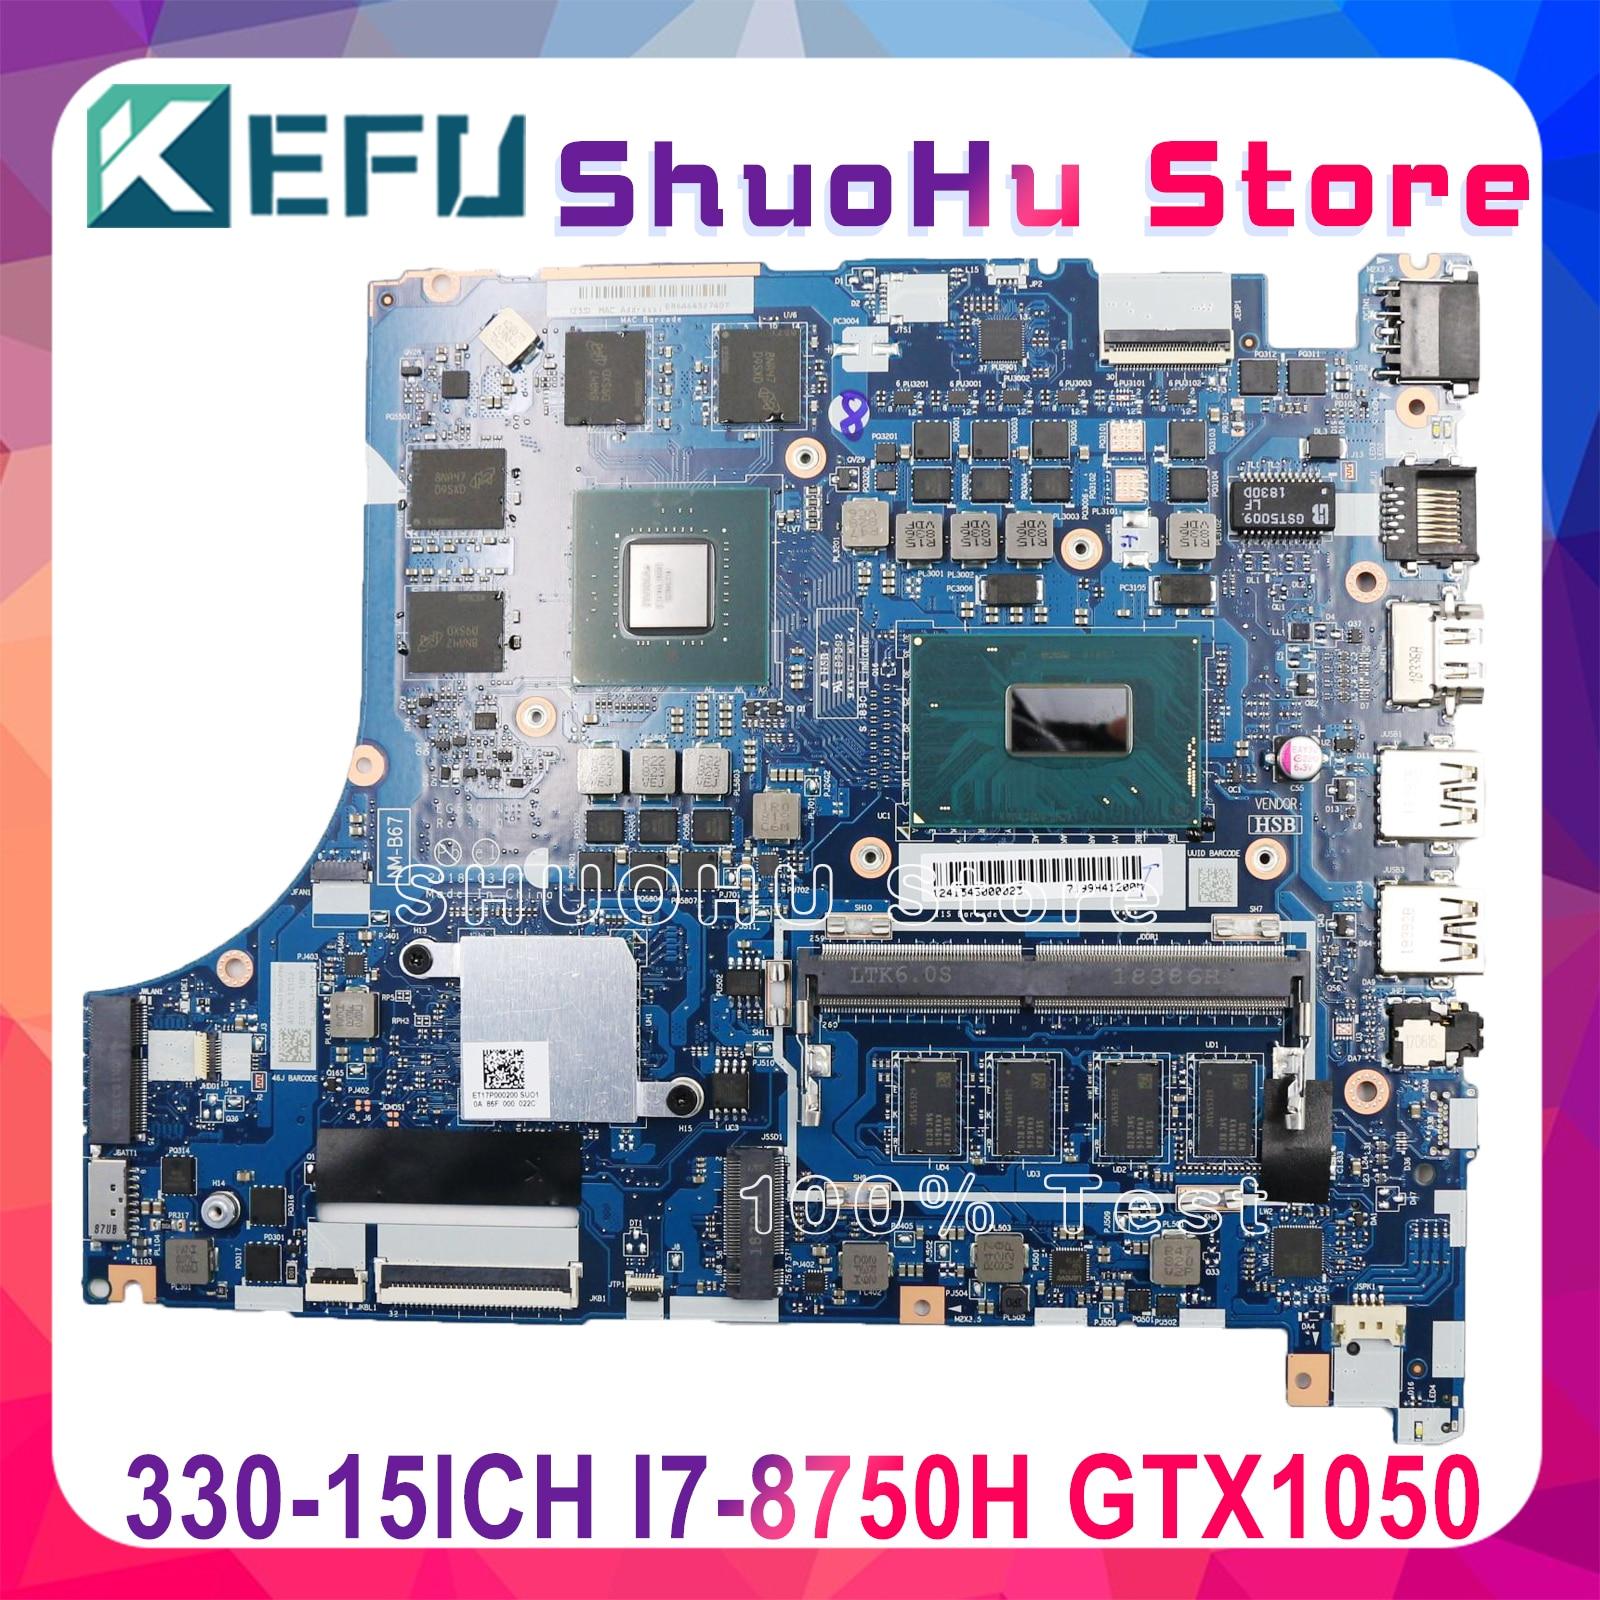 KEFU EG530 NM-B671 اللوحة لينوفو Ideapad 330 330-17ICH 330-15ICH اللوحة I7-8750H GTX1050 اختبار الأصلي